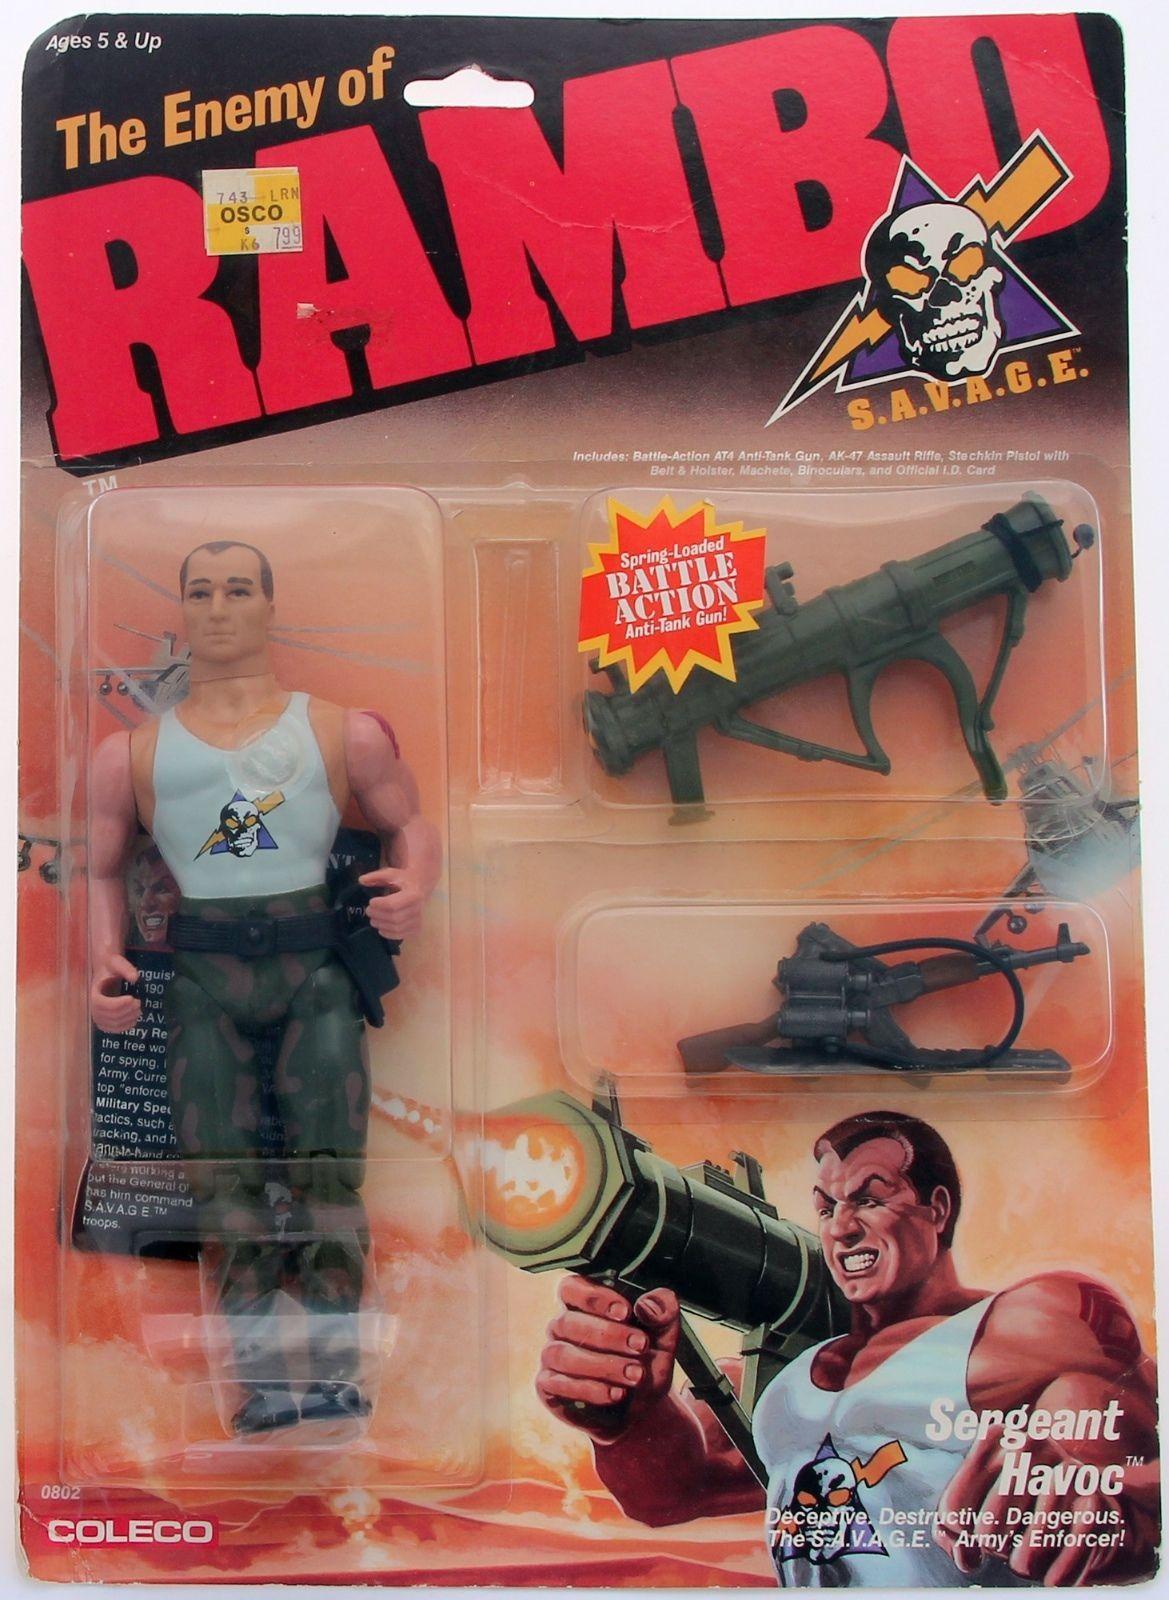 Coleco 1986 Sergeant Havoc Enemy of Rambo | eBay